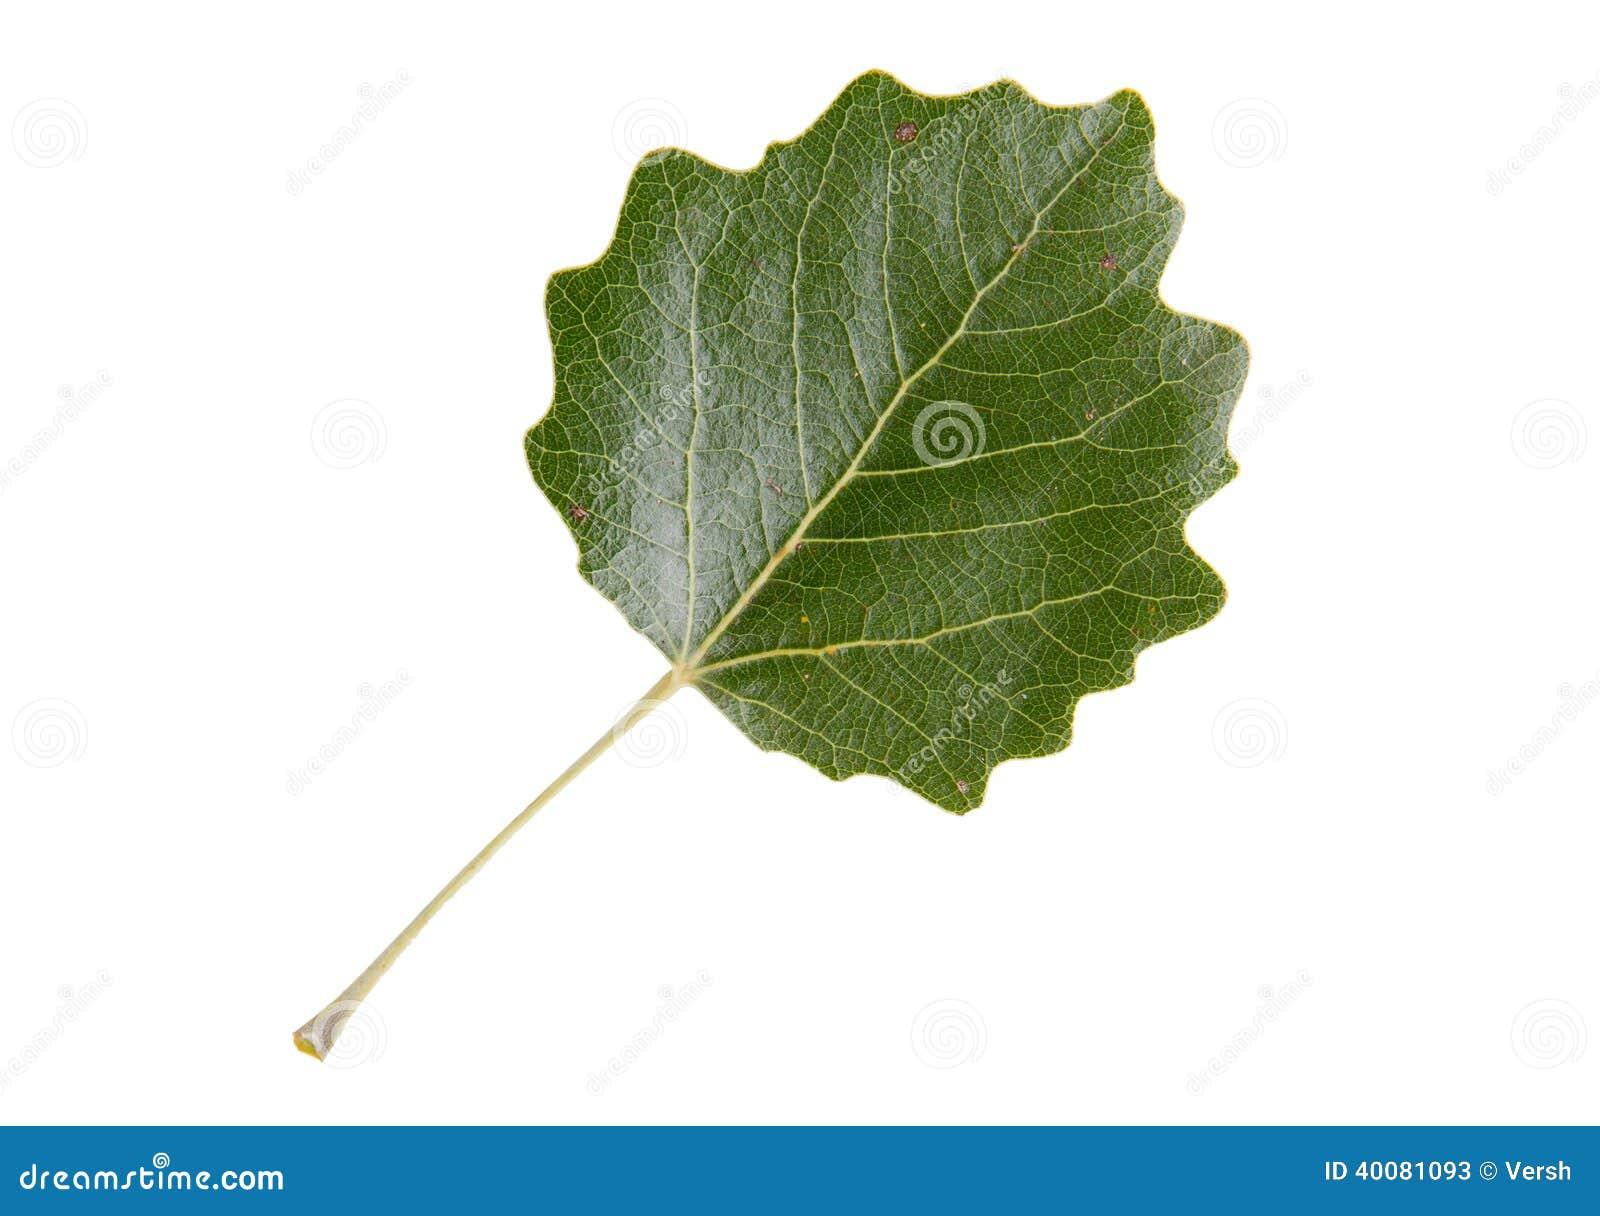 White Poplar Tree Leaf leaf of white poplar tree